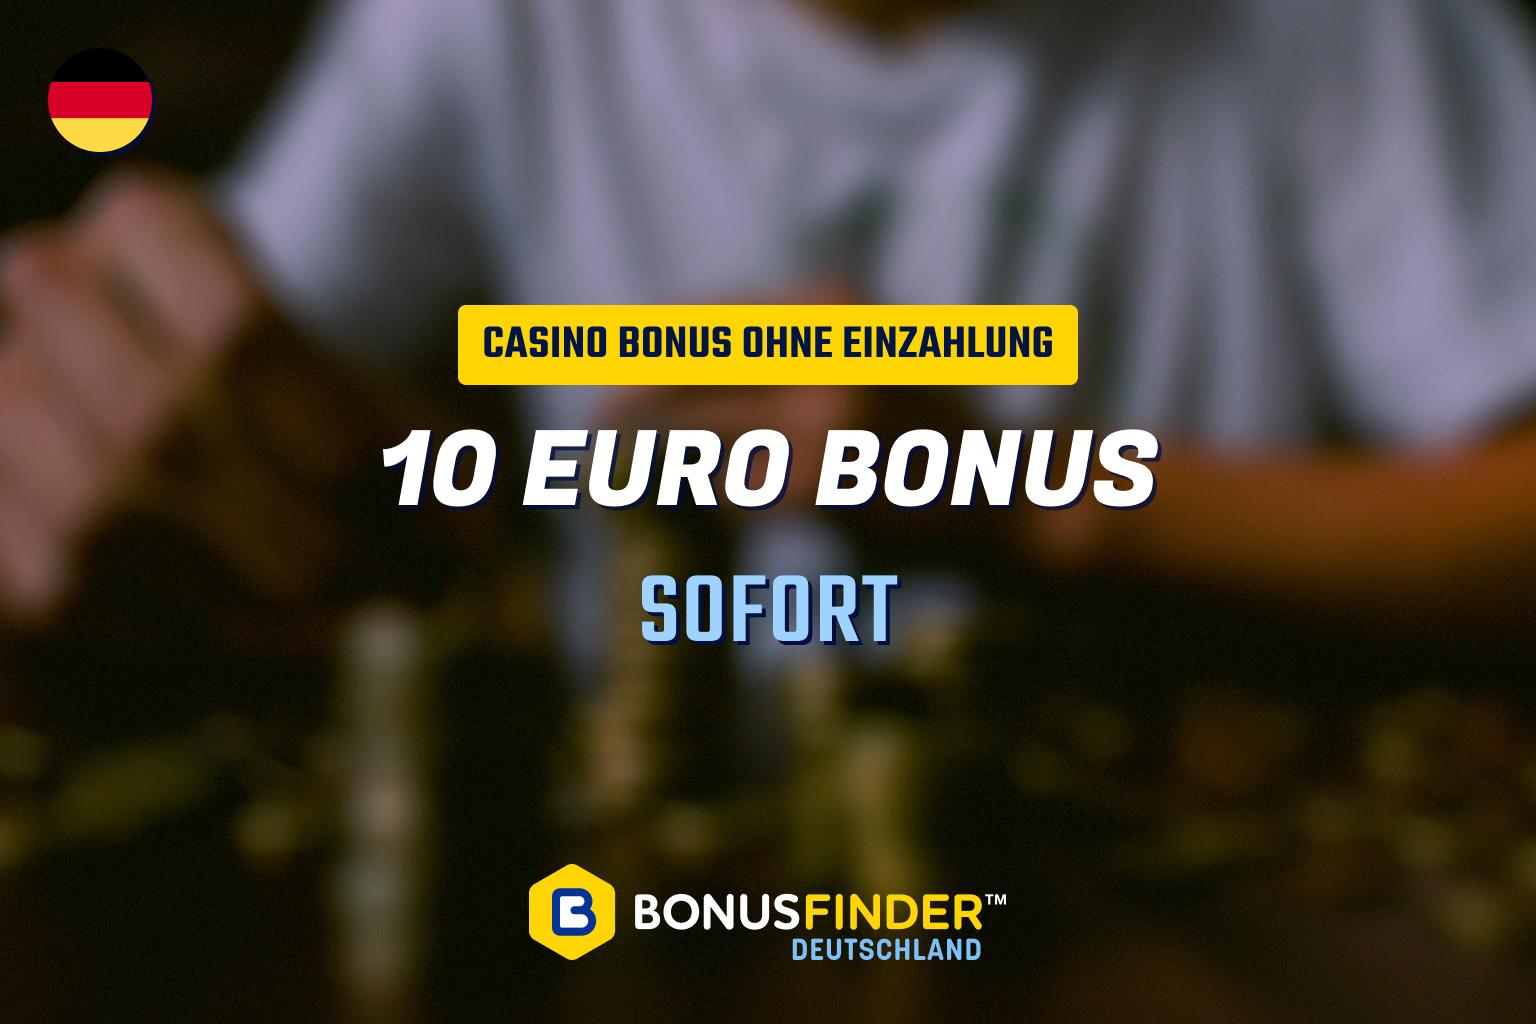 10 euro bonus ohne einzahlung sofort